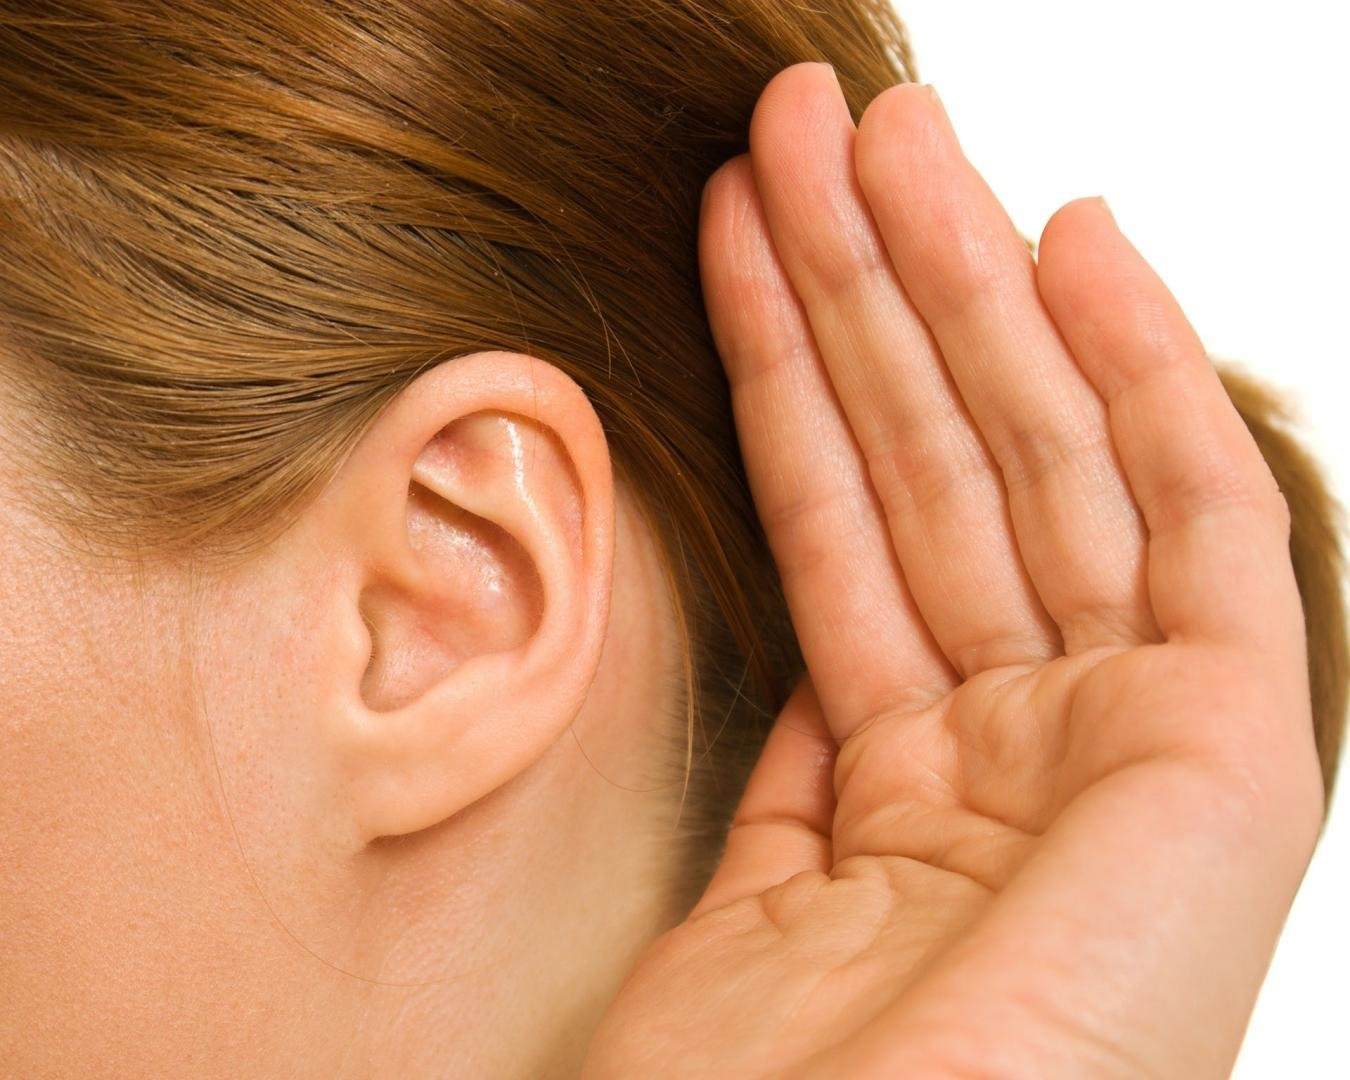 Perte auditive - Sarah Bitbol - Saint-Maur-des-Fossés